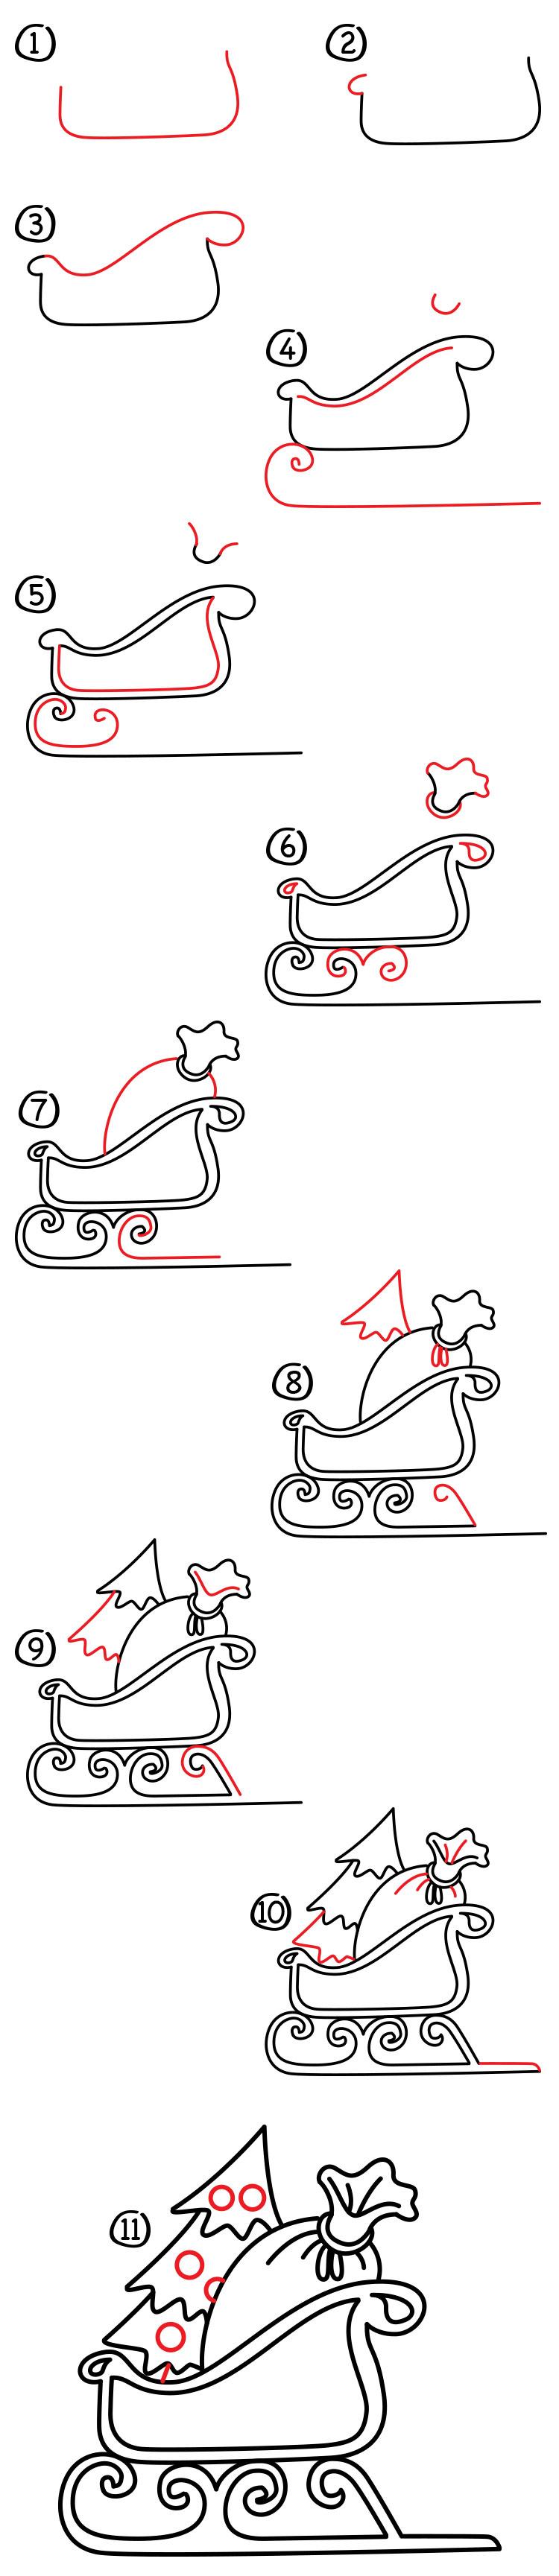 Santa Sleigh Drawings : santa, sleigh, drawings, Santa's, Sleigh